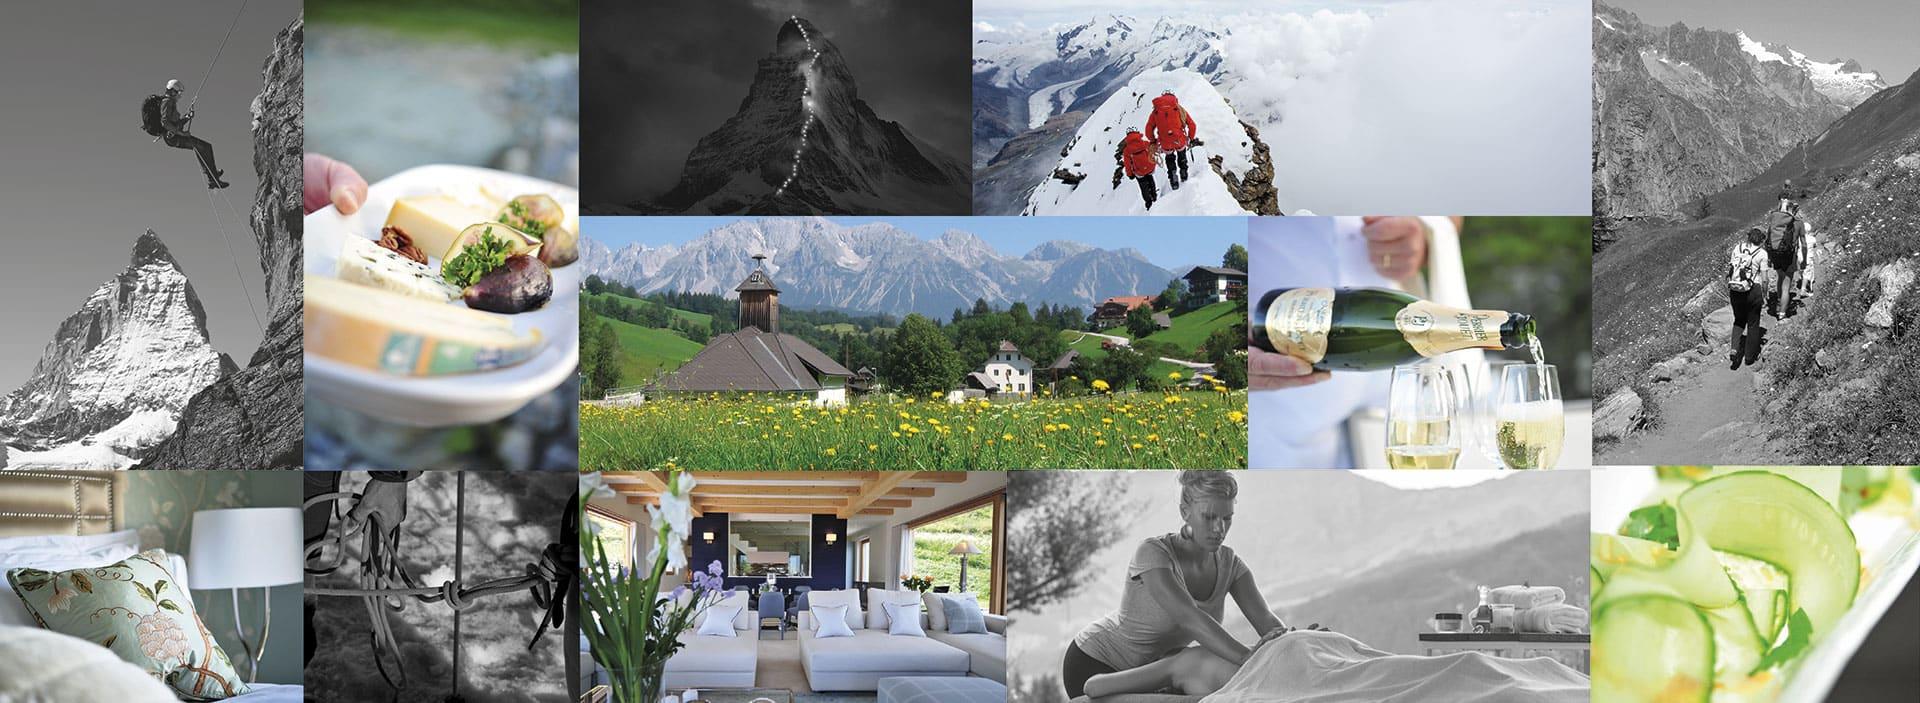 Luxury Alpine Vacation Collage